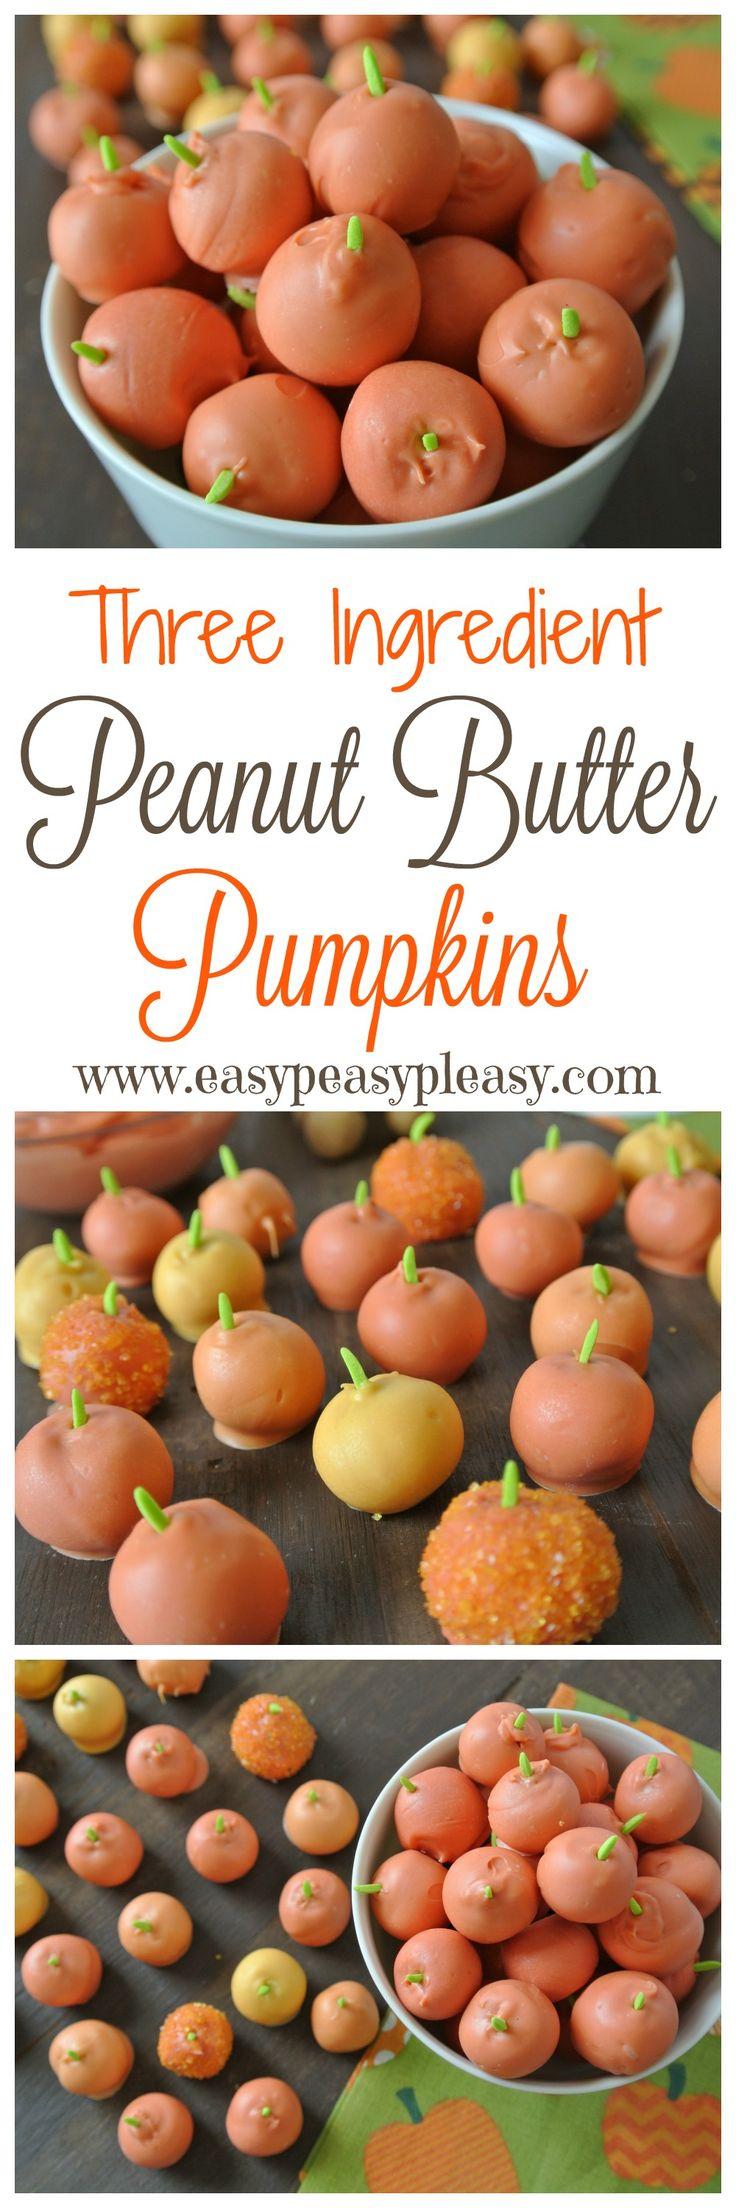 Easy 3 ingredient Peanut Butter Pumpkins